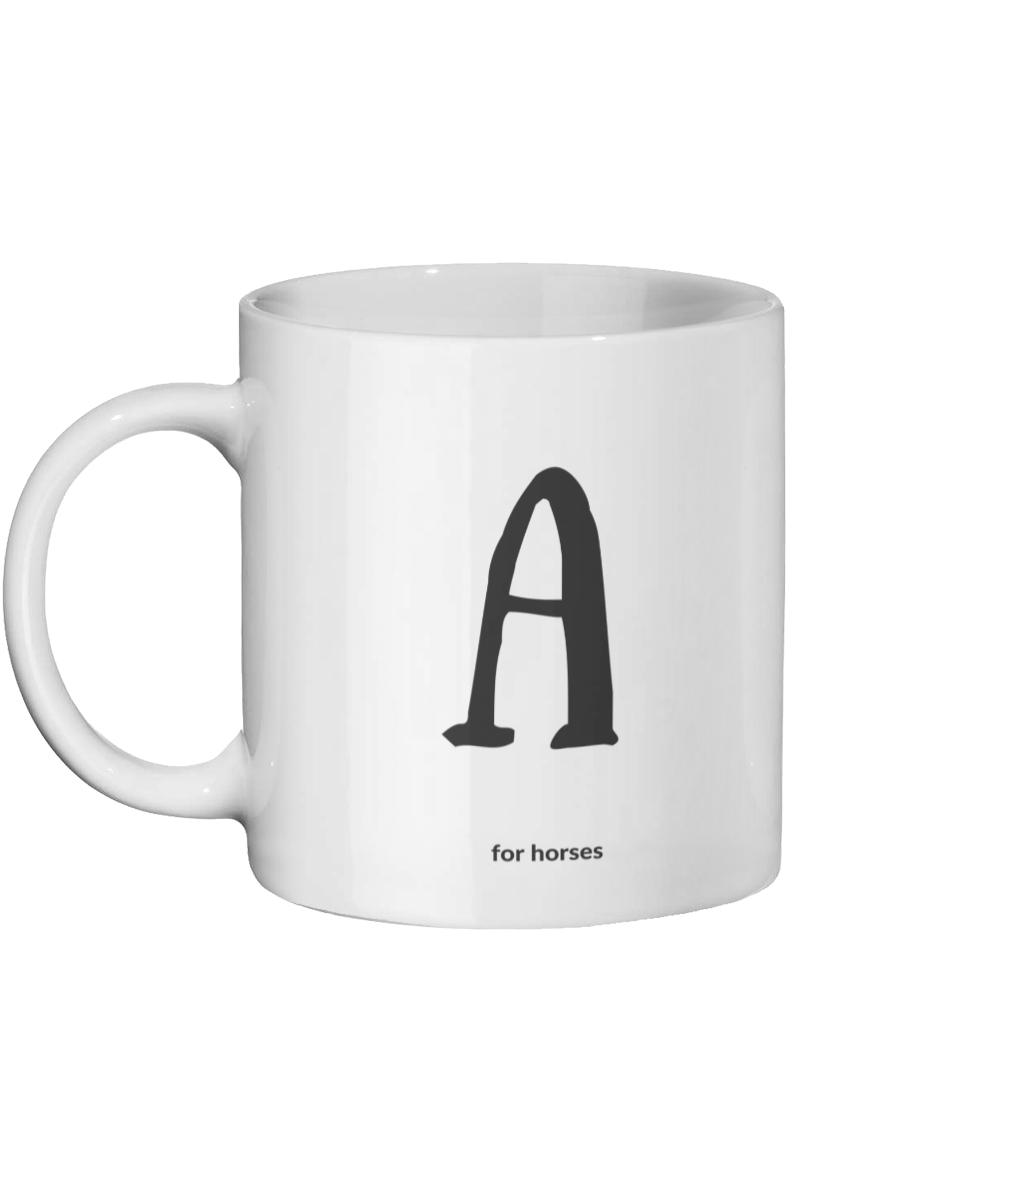 A for Horses Mug